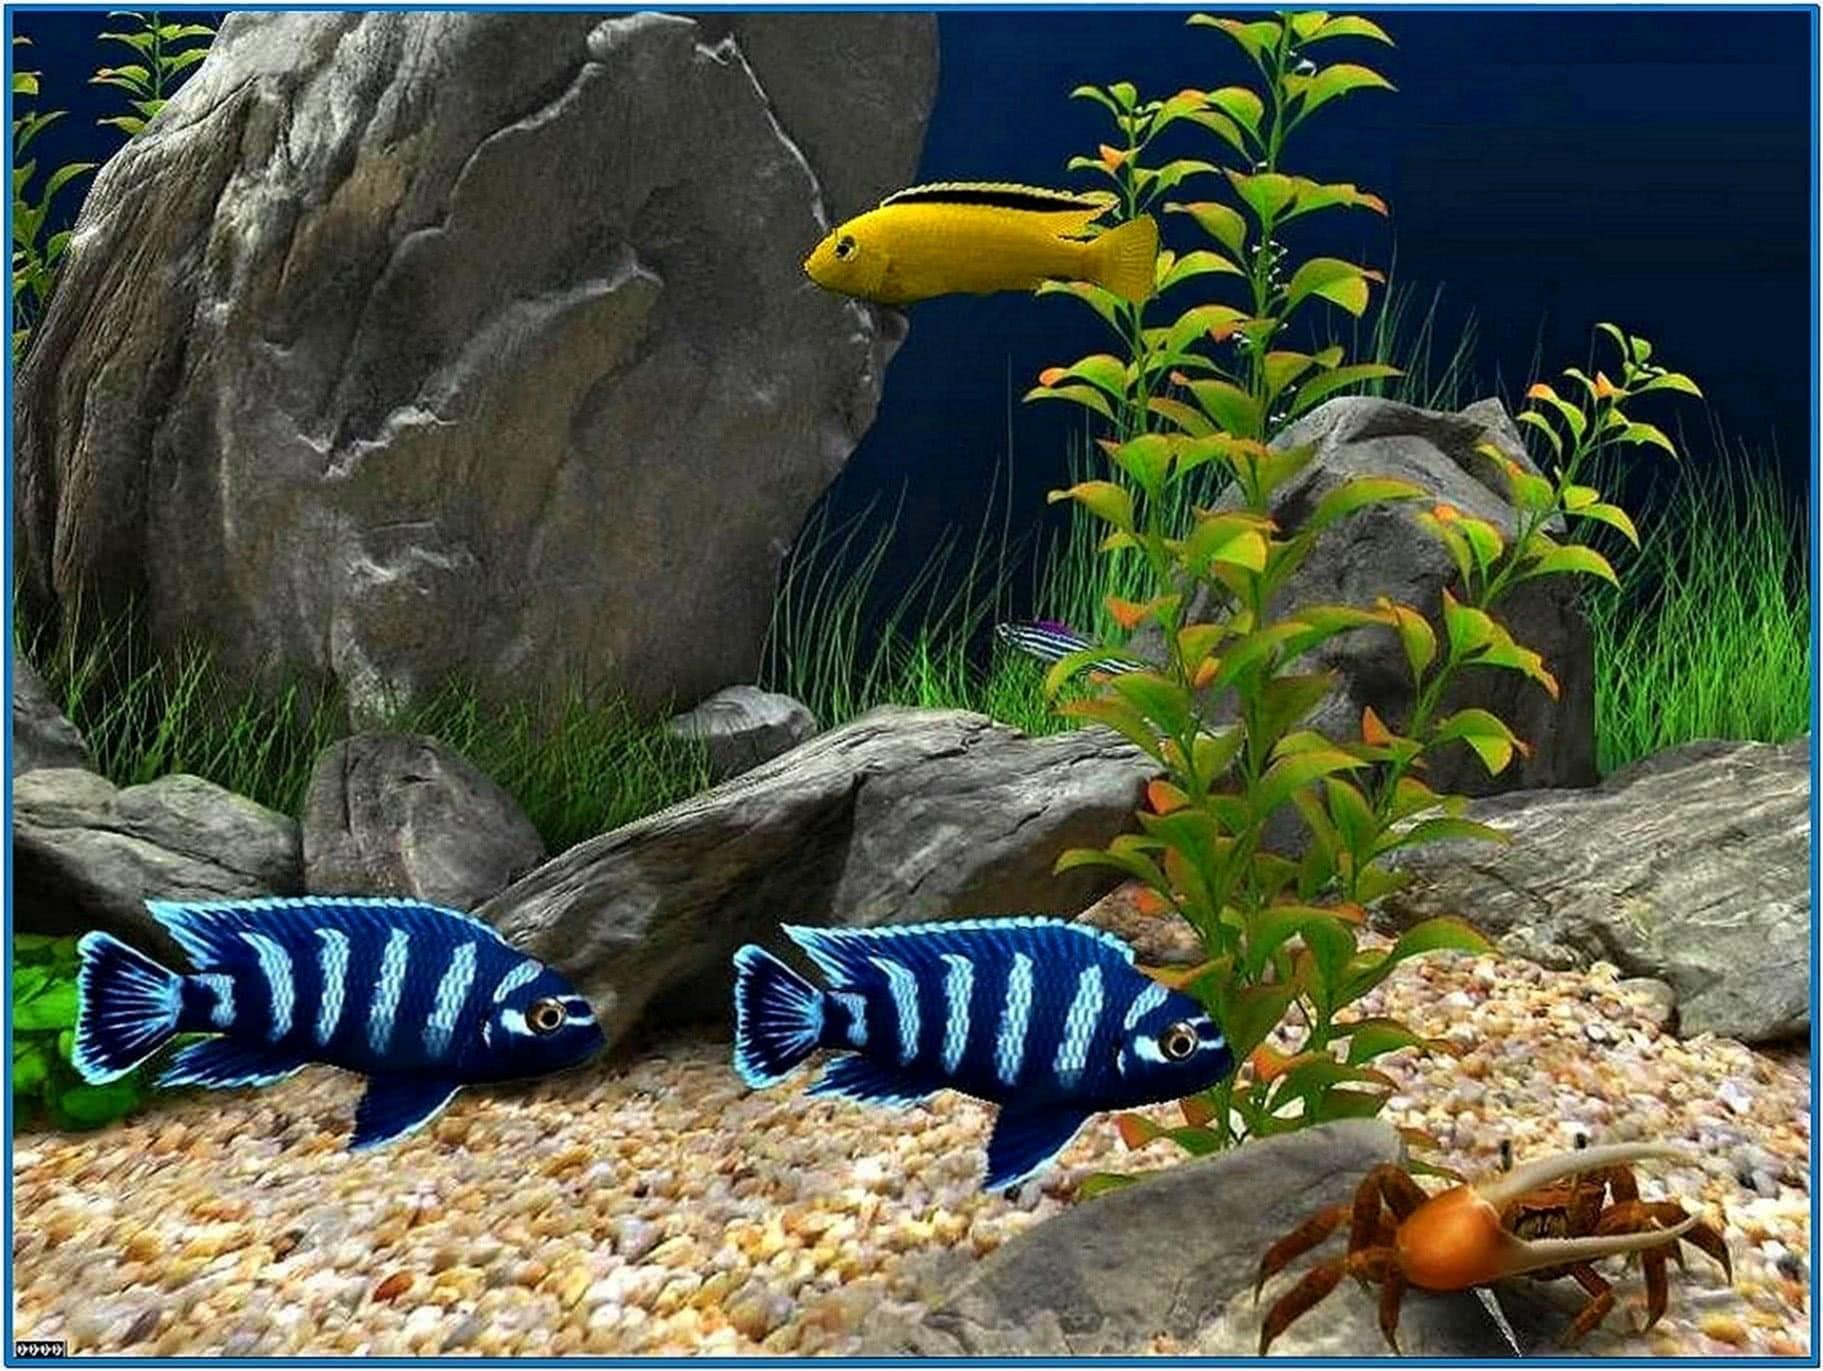 Dream Aquarium Screensaver Vista